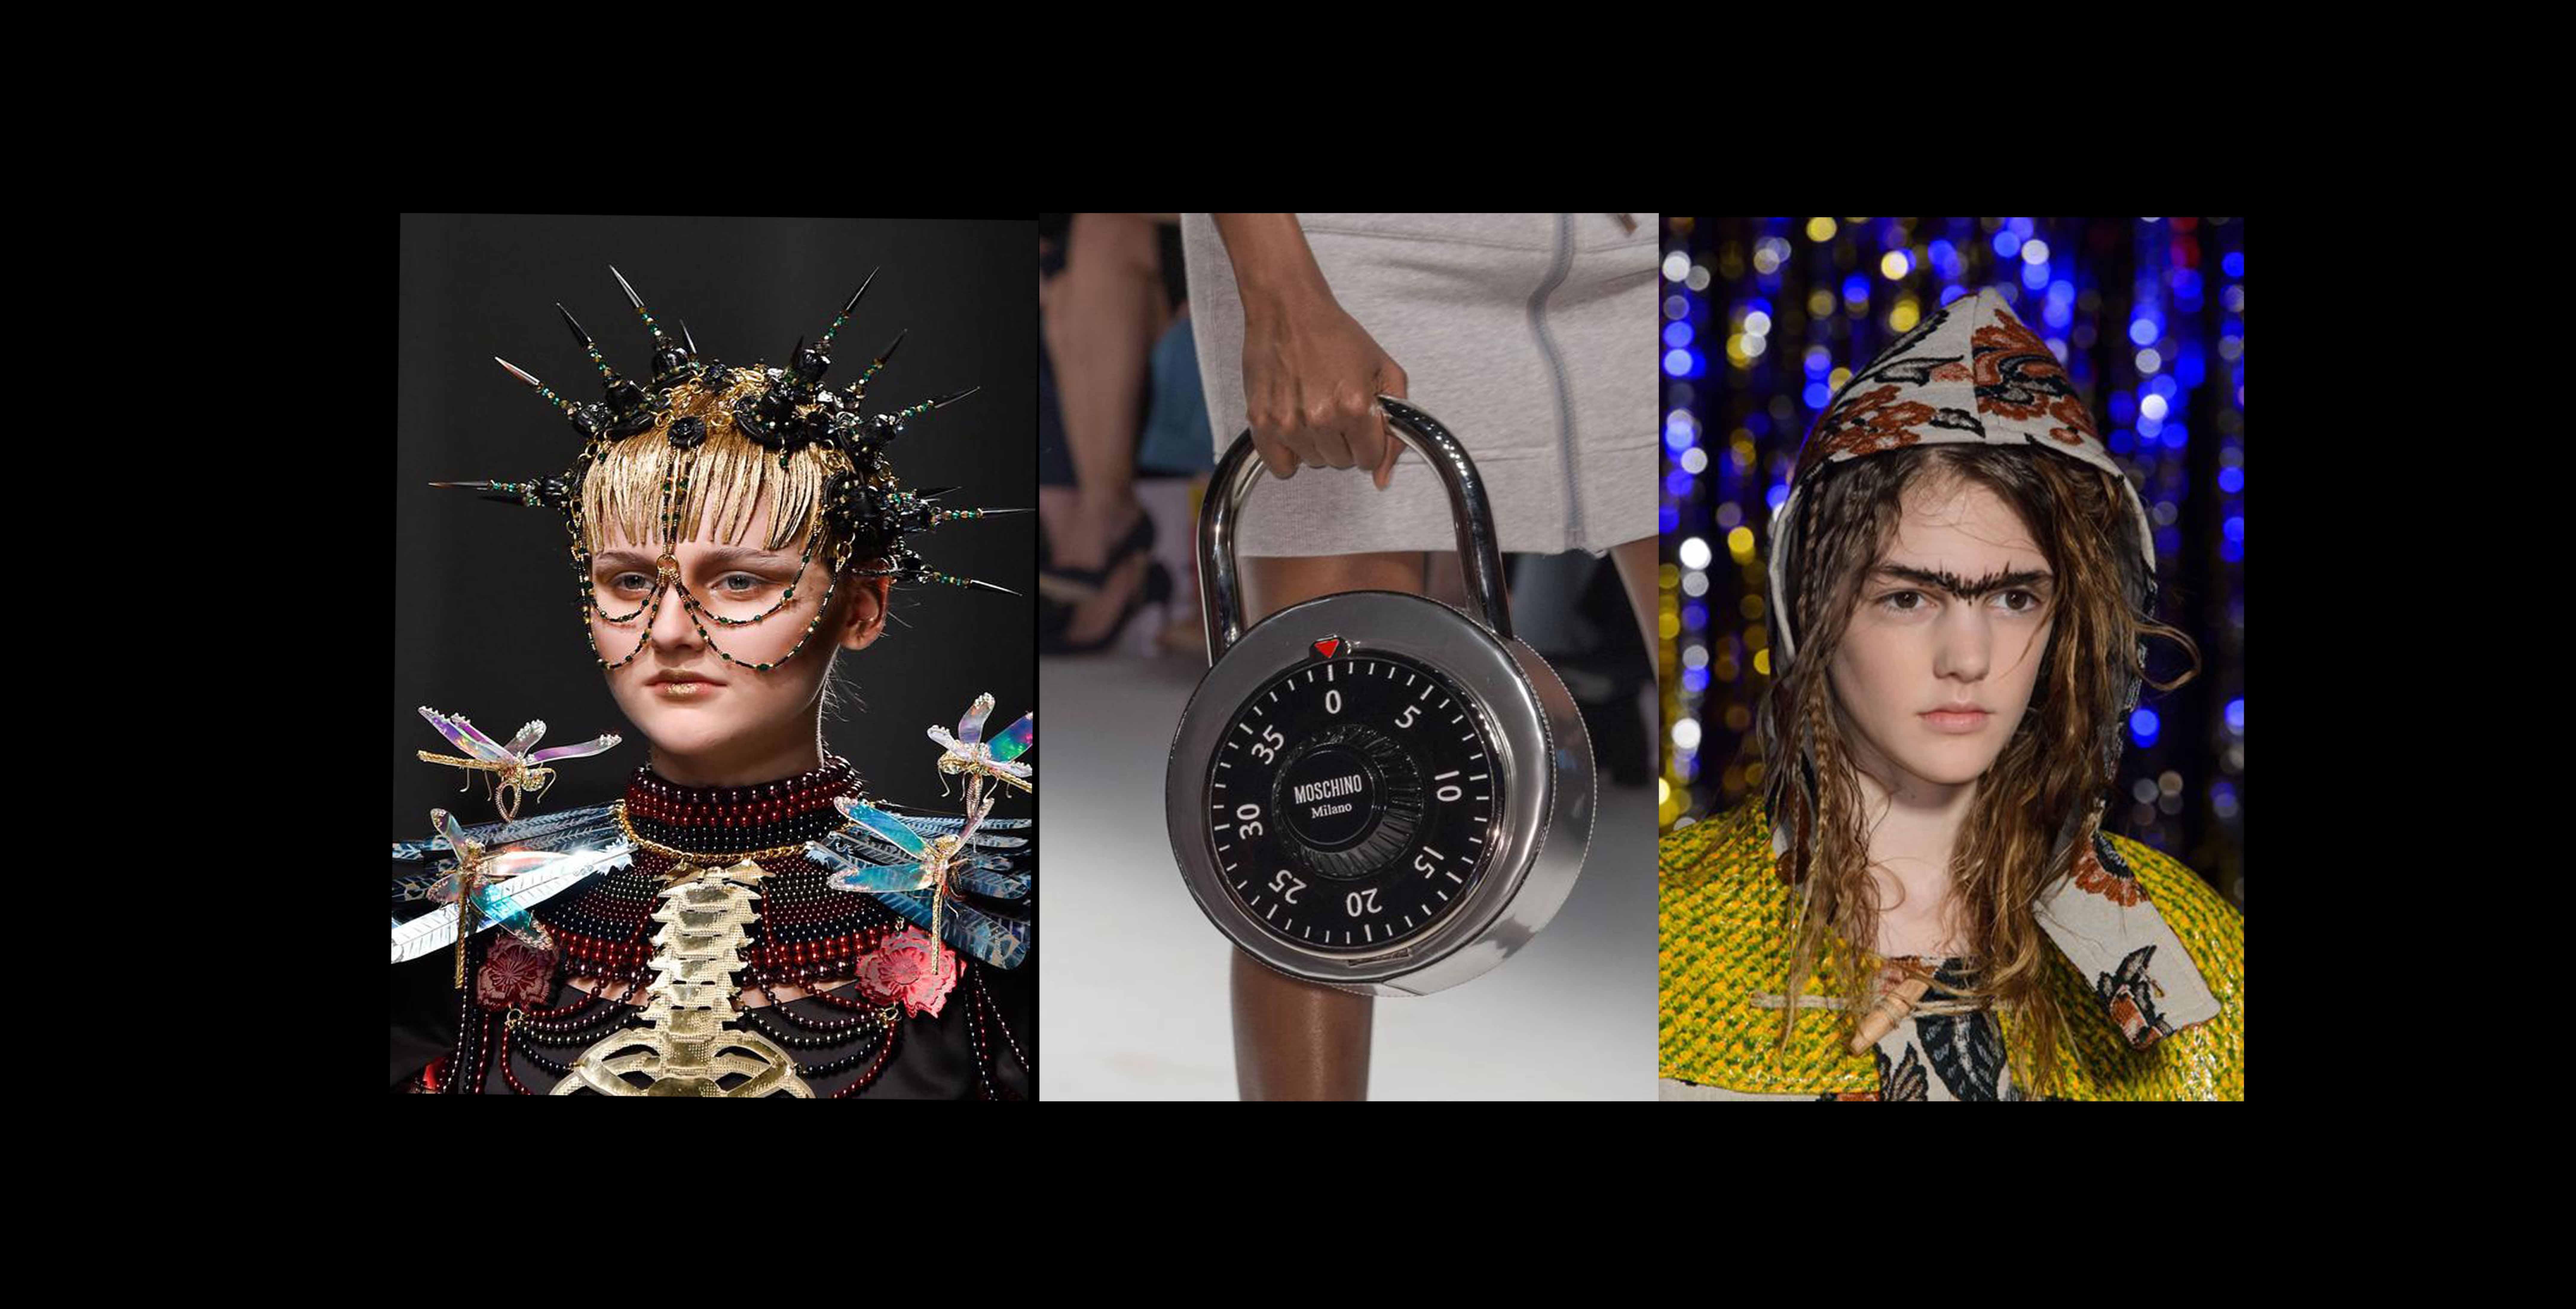 Le pire de la Fashion Week